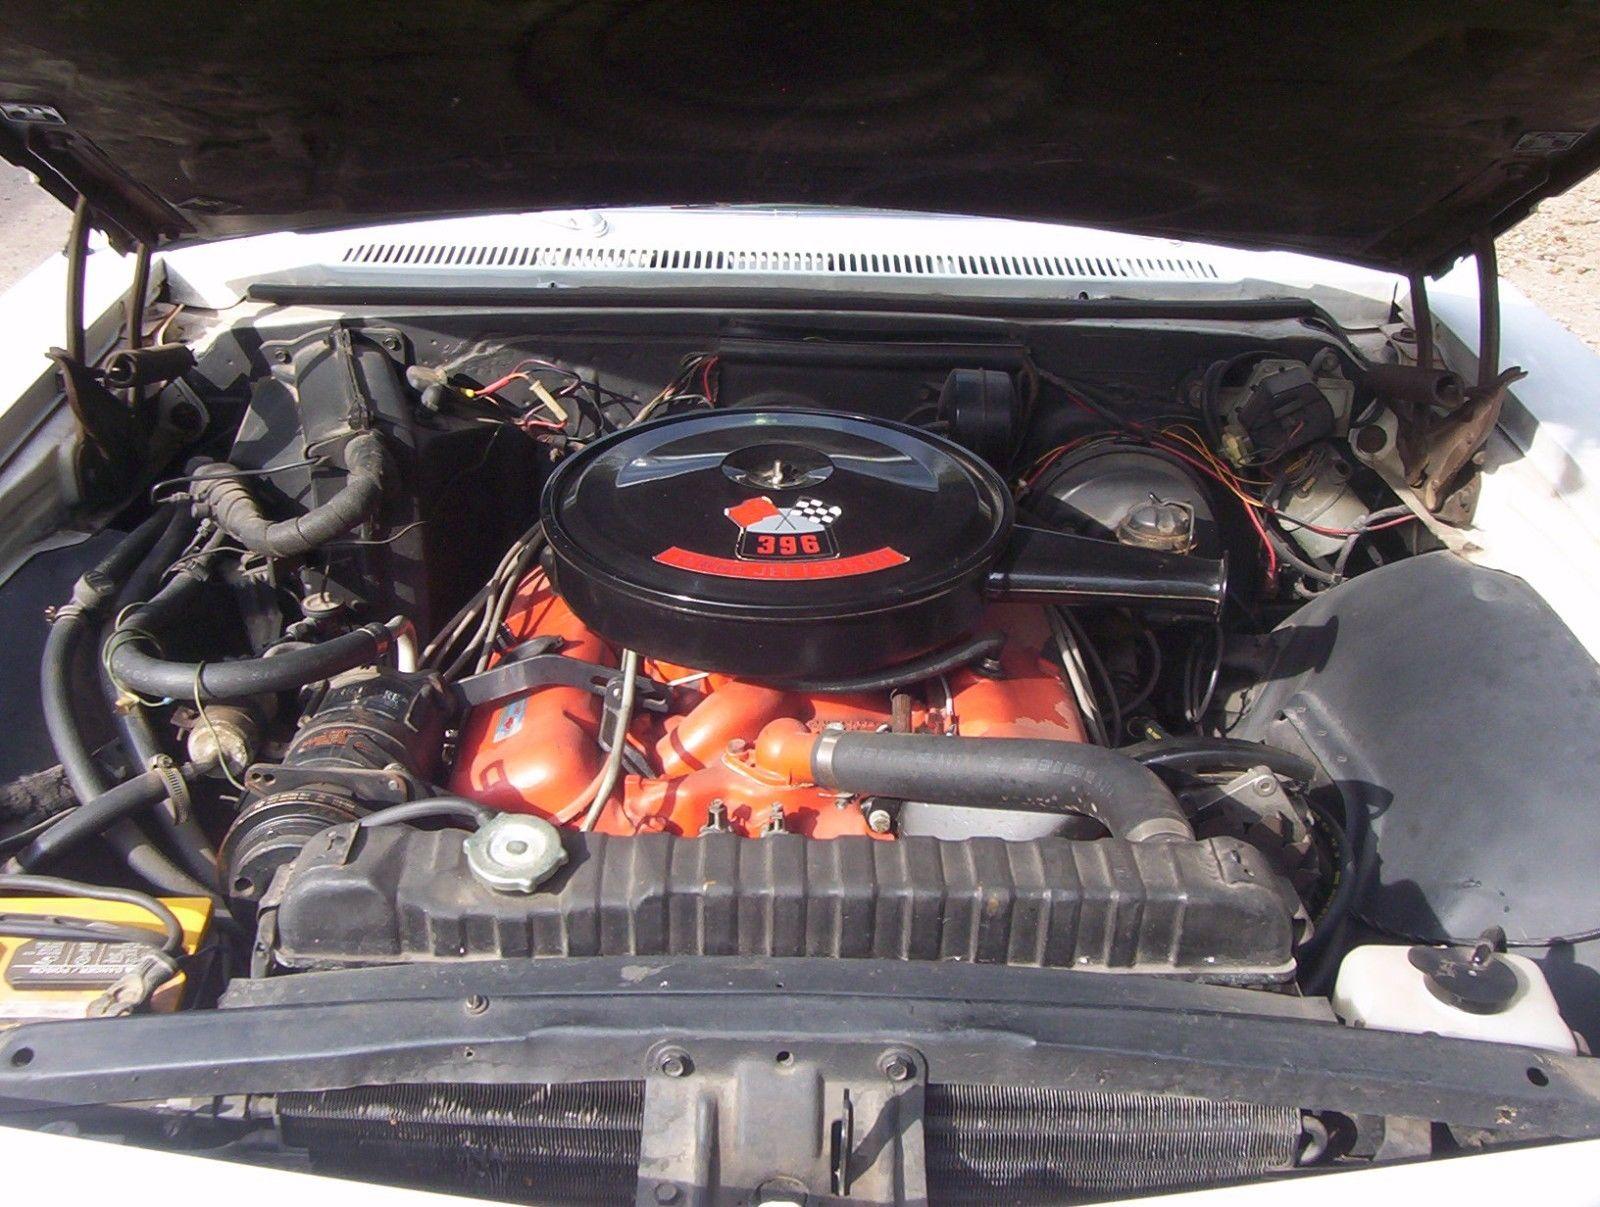 1966-Chevrolet-Impala-Wagon-396-engine